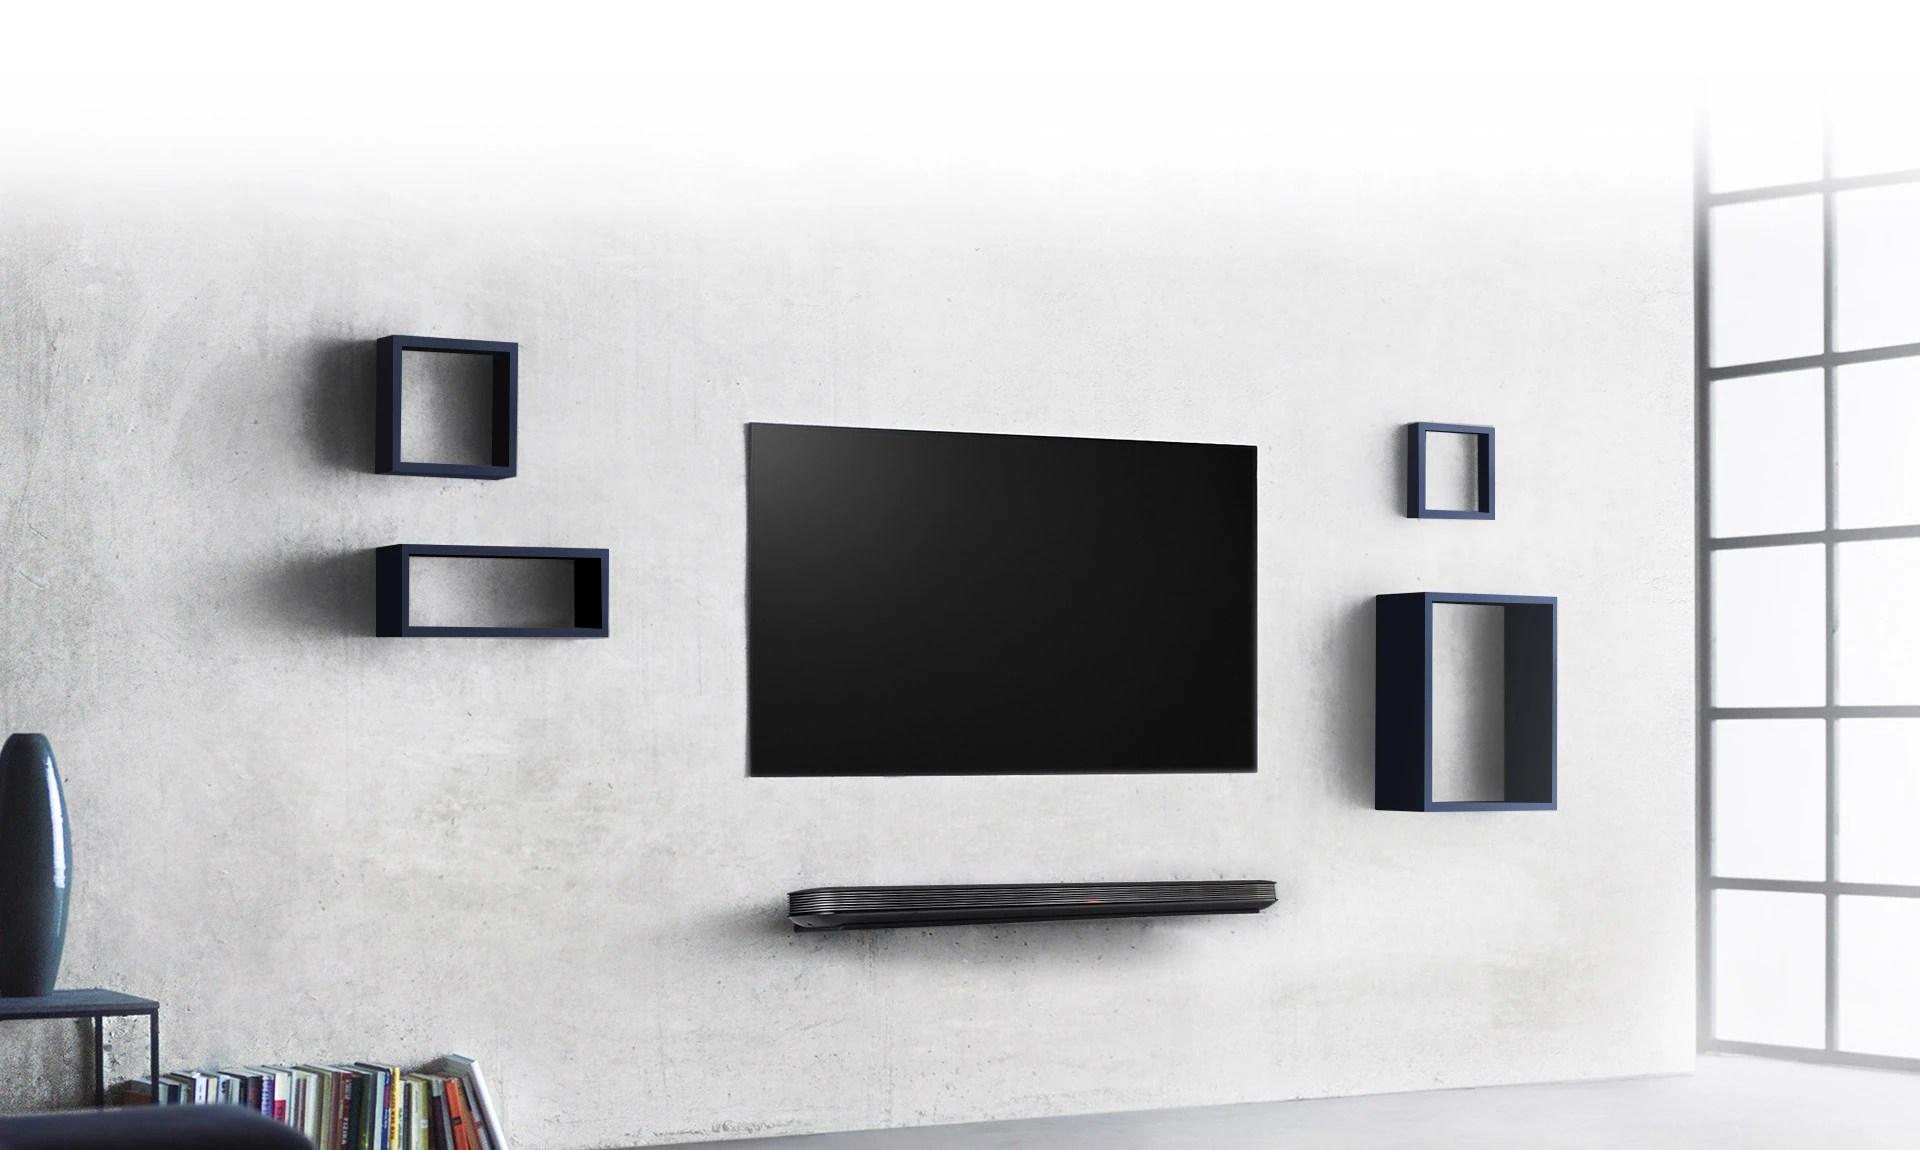 3d Wallpaper For Living Room Wall Lg Signature Wallpaper Oled Tv 65 Inch Lg Oled65w7t